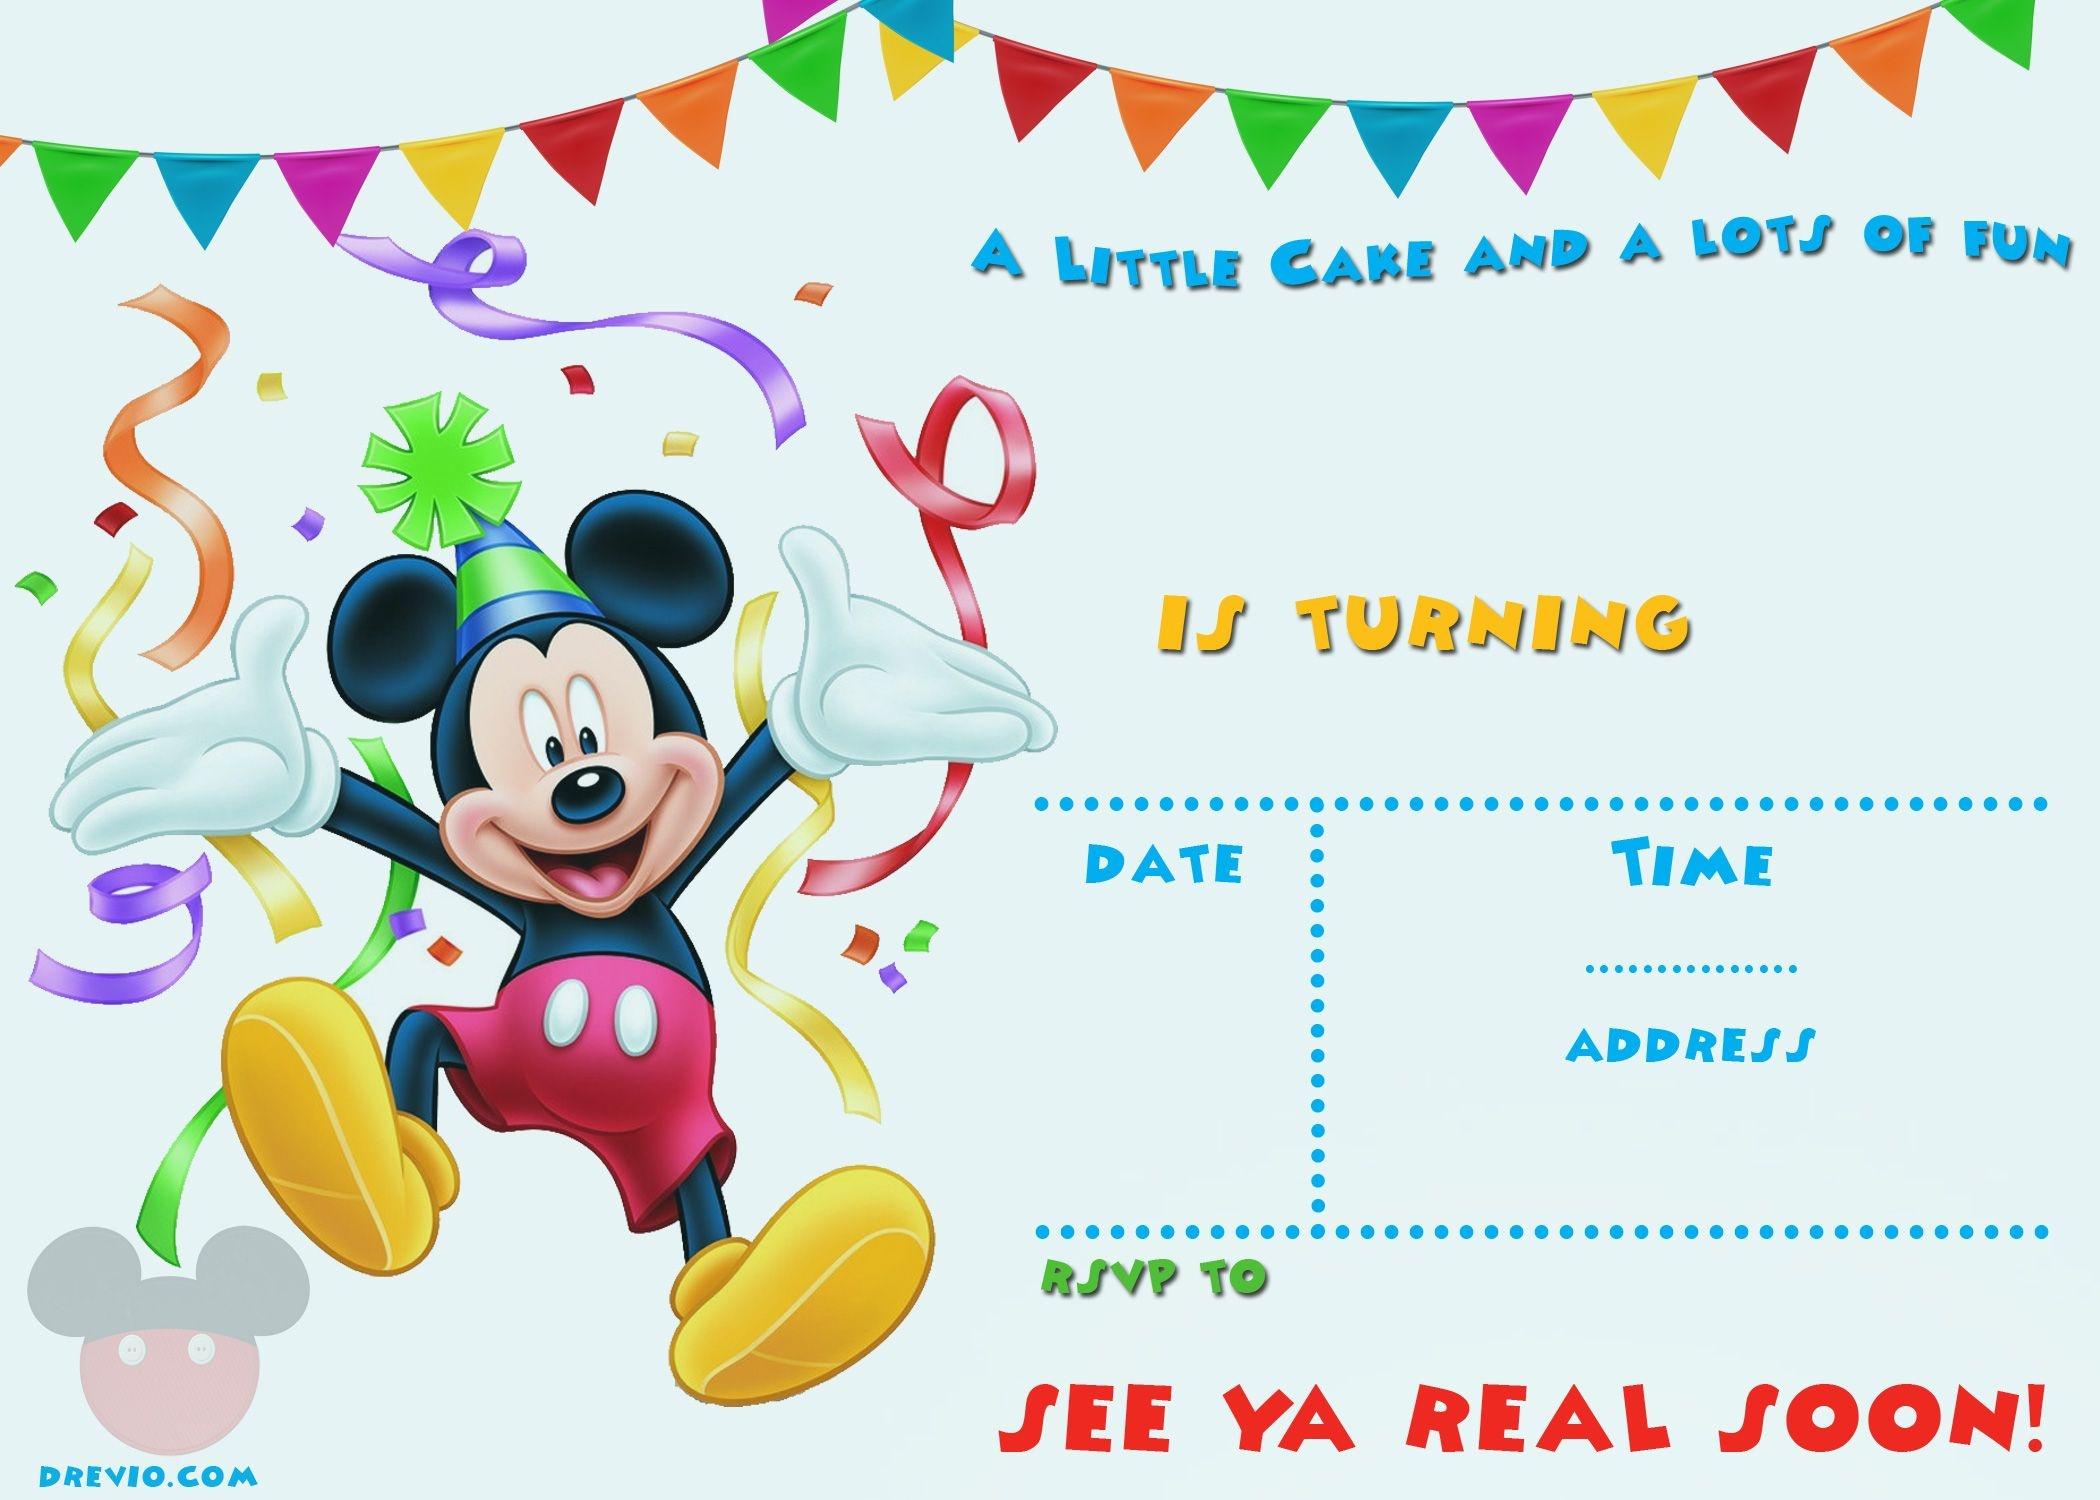 Free Printable Mickey Mouse Party Invitation Template | Free - Free Printable Mickey Mouse Birthday Invitations